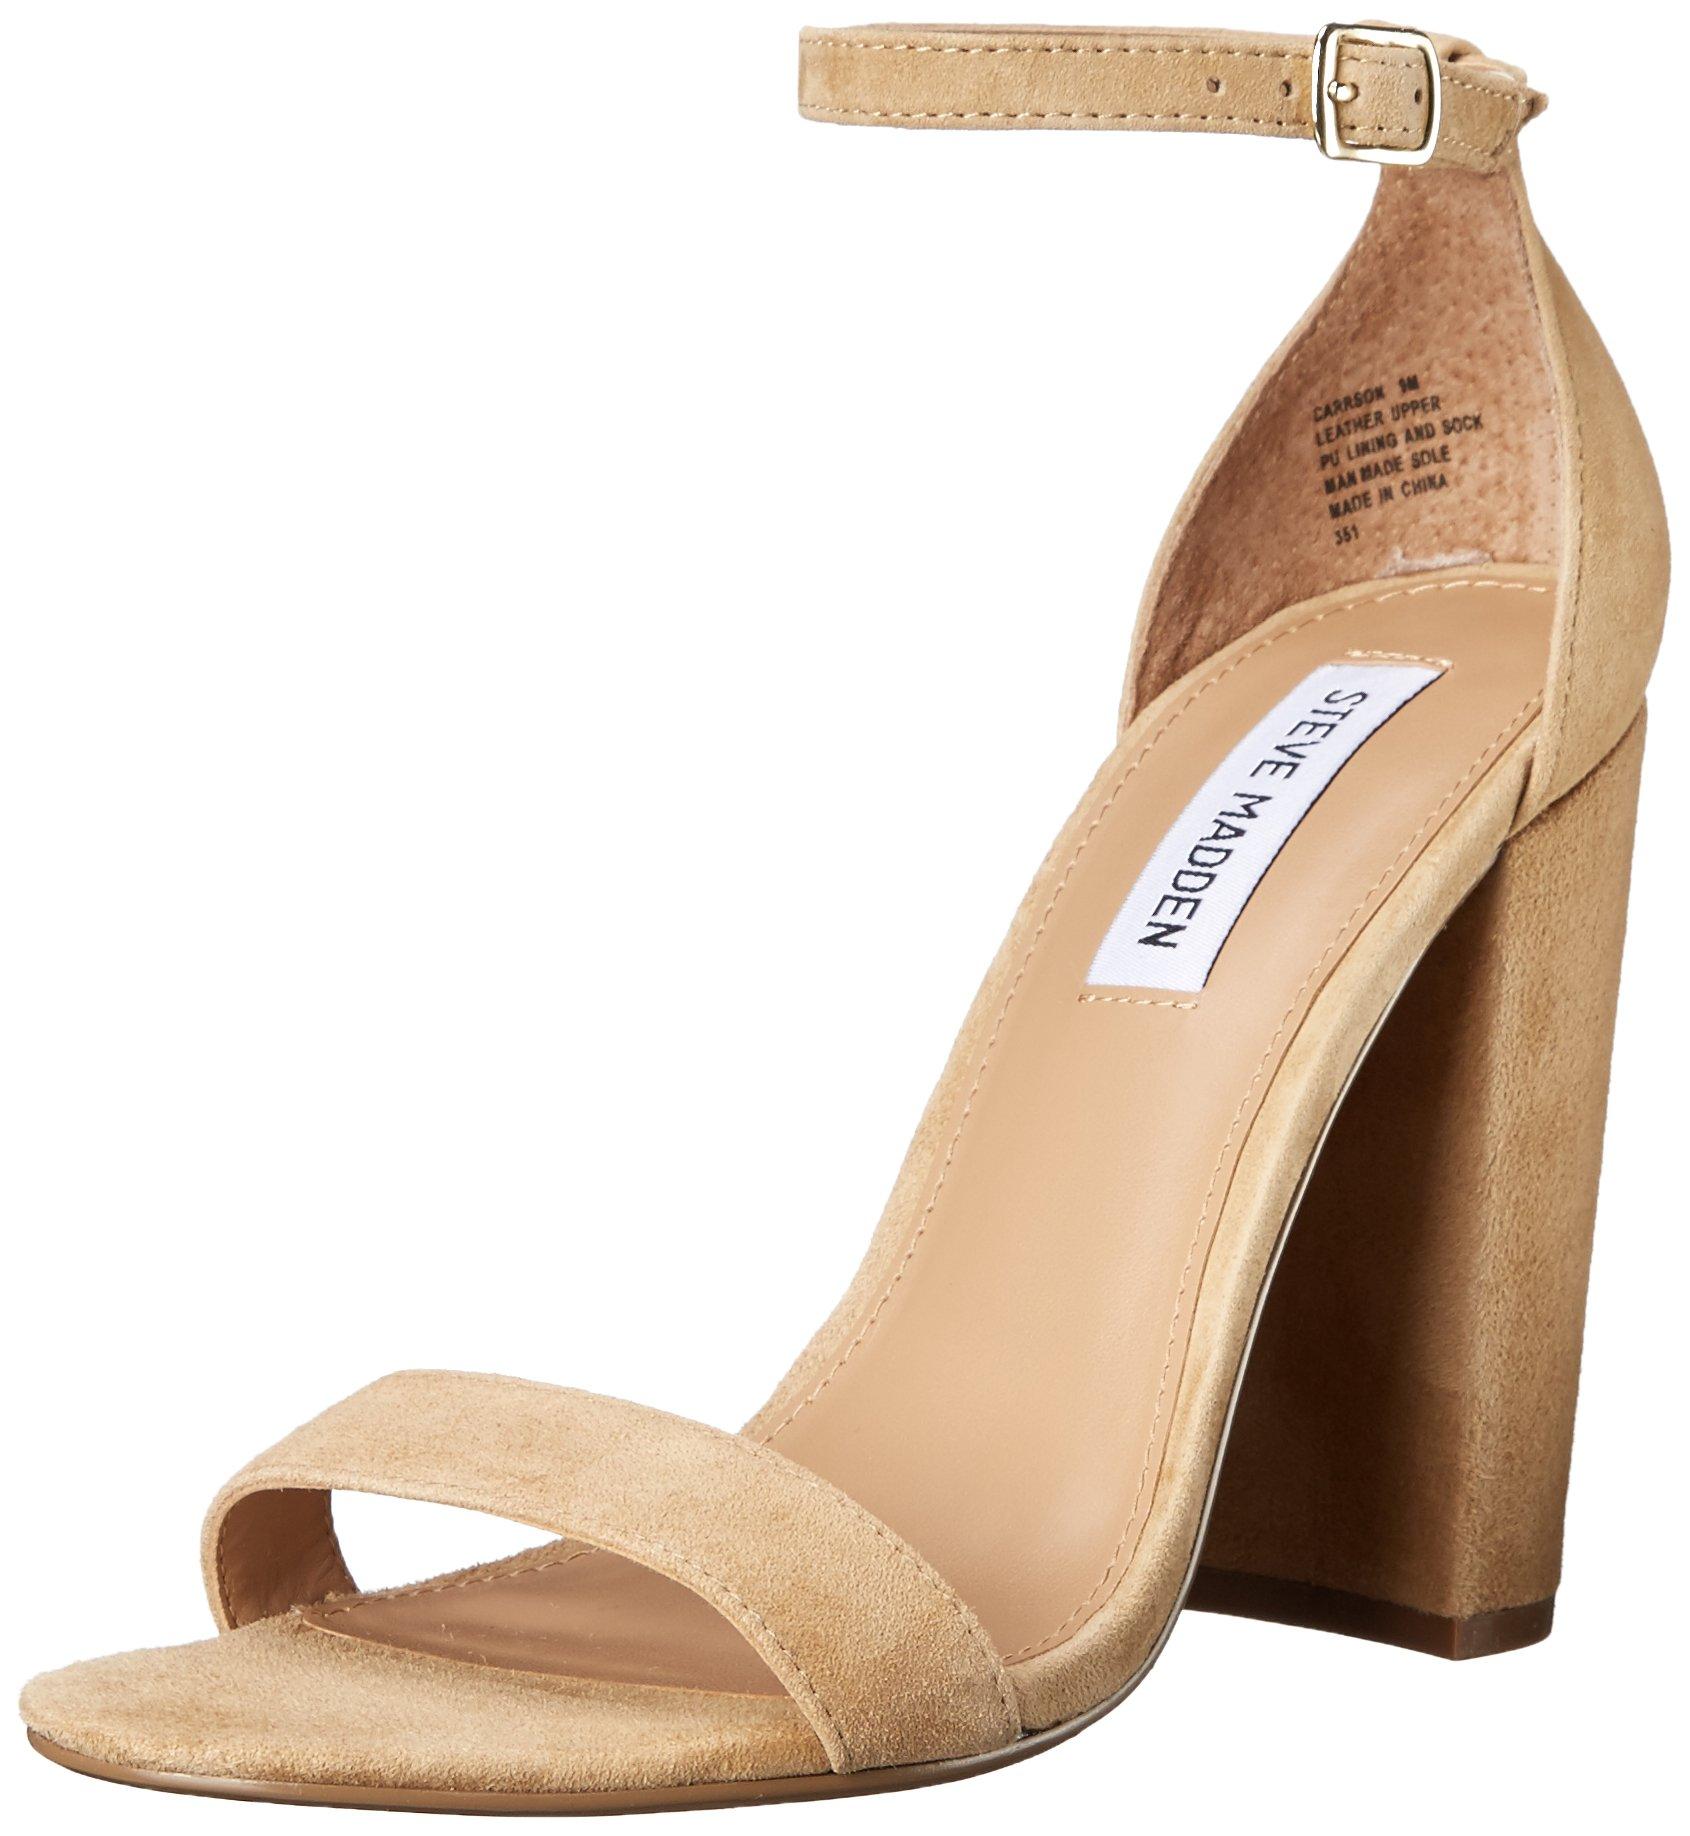 Steve Madden Women's Carrson Dress Sandal, Sand Suede, 9 M US